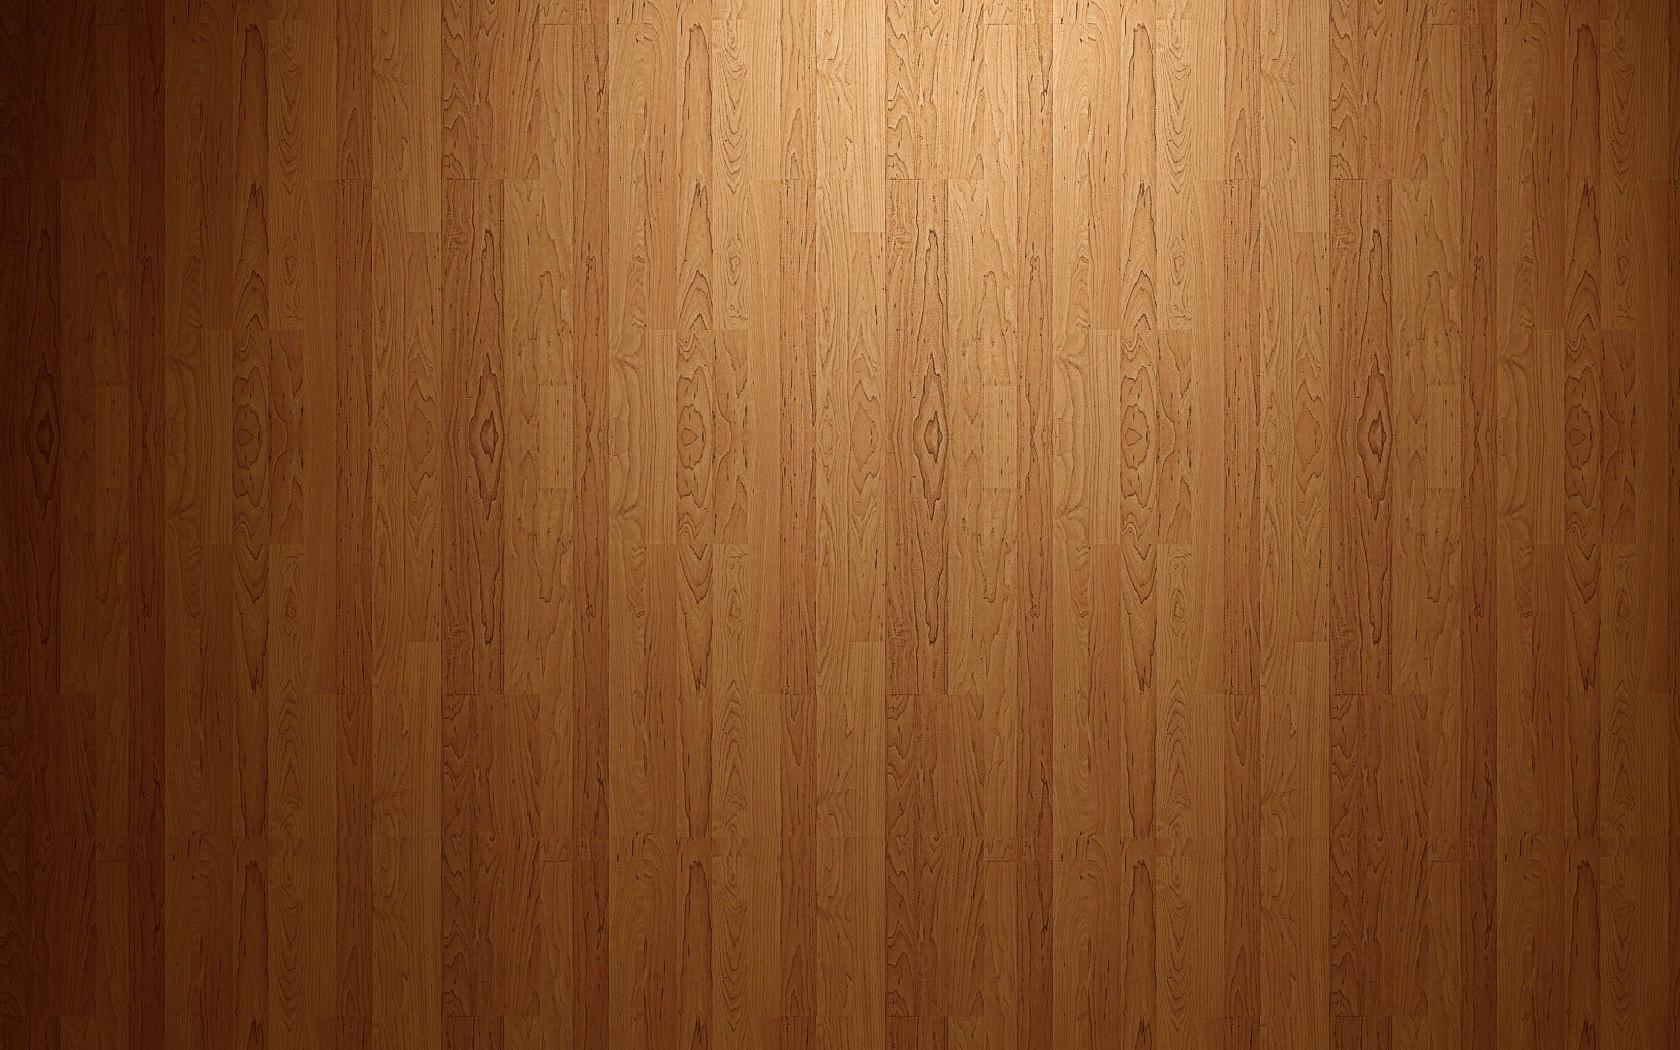 Uberlegen Holz Textur Stock Hartholz Sperrholz Bodenbelag Holzboden Holzbeize  Laminatboden